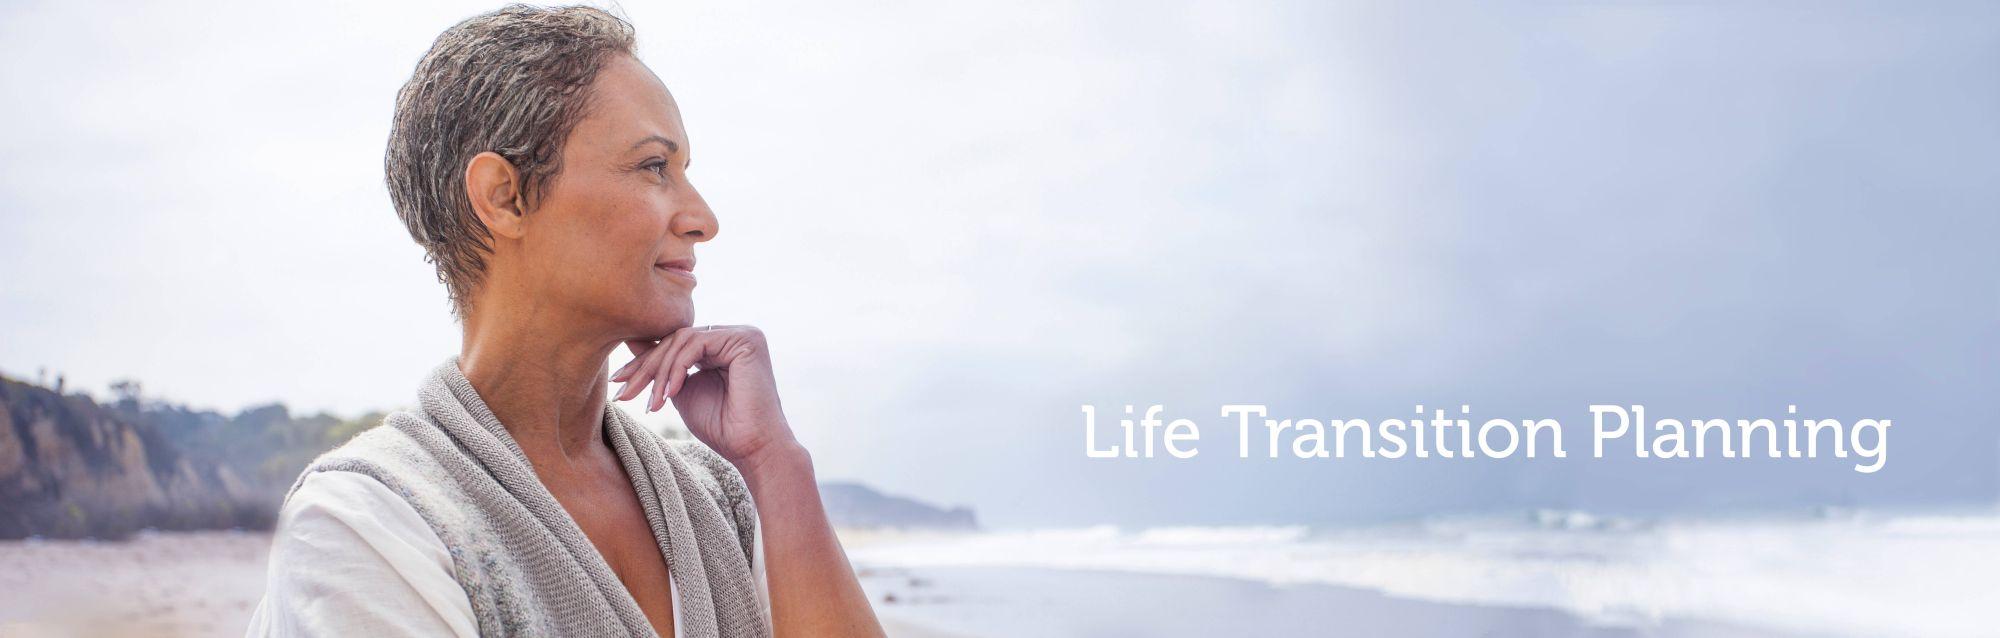 Life Transition Planning